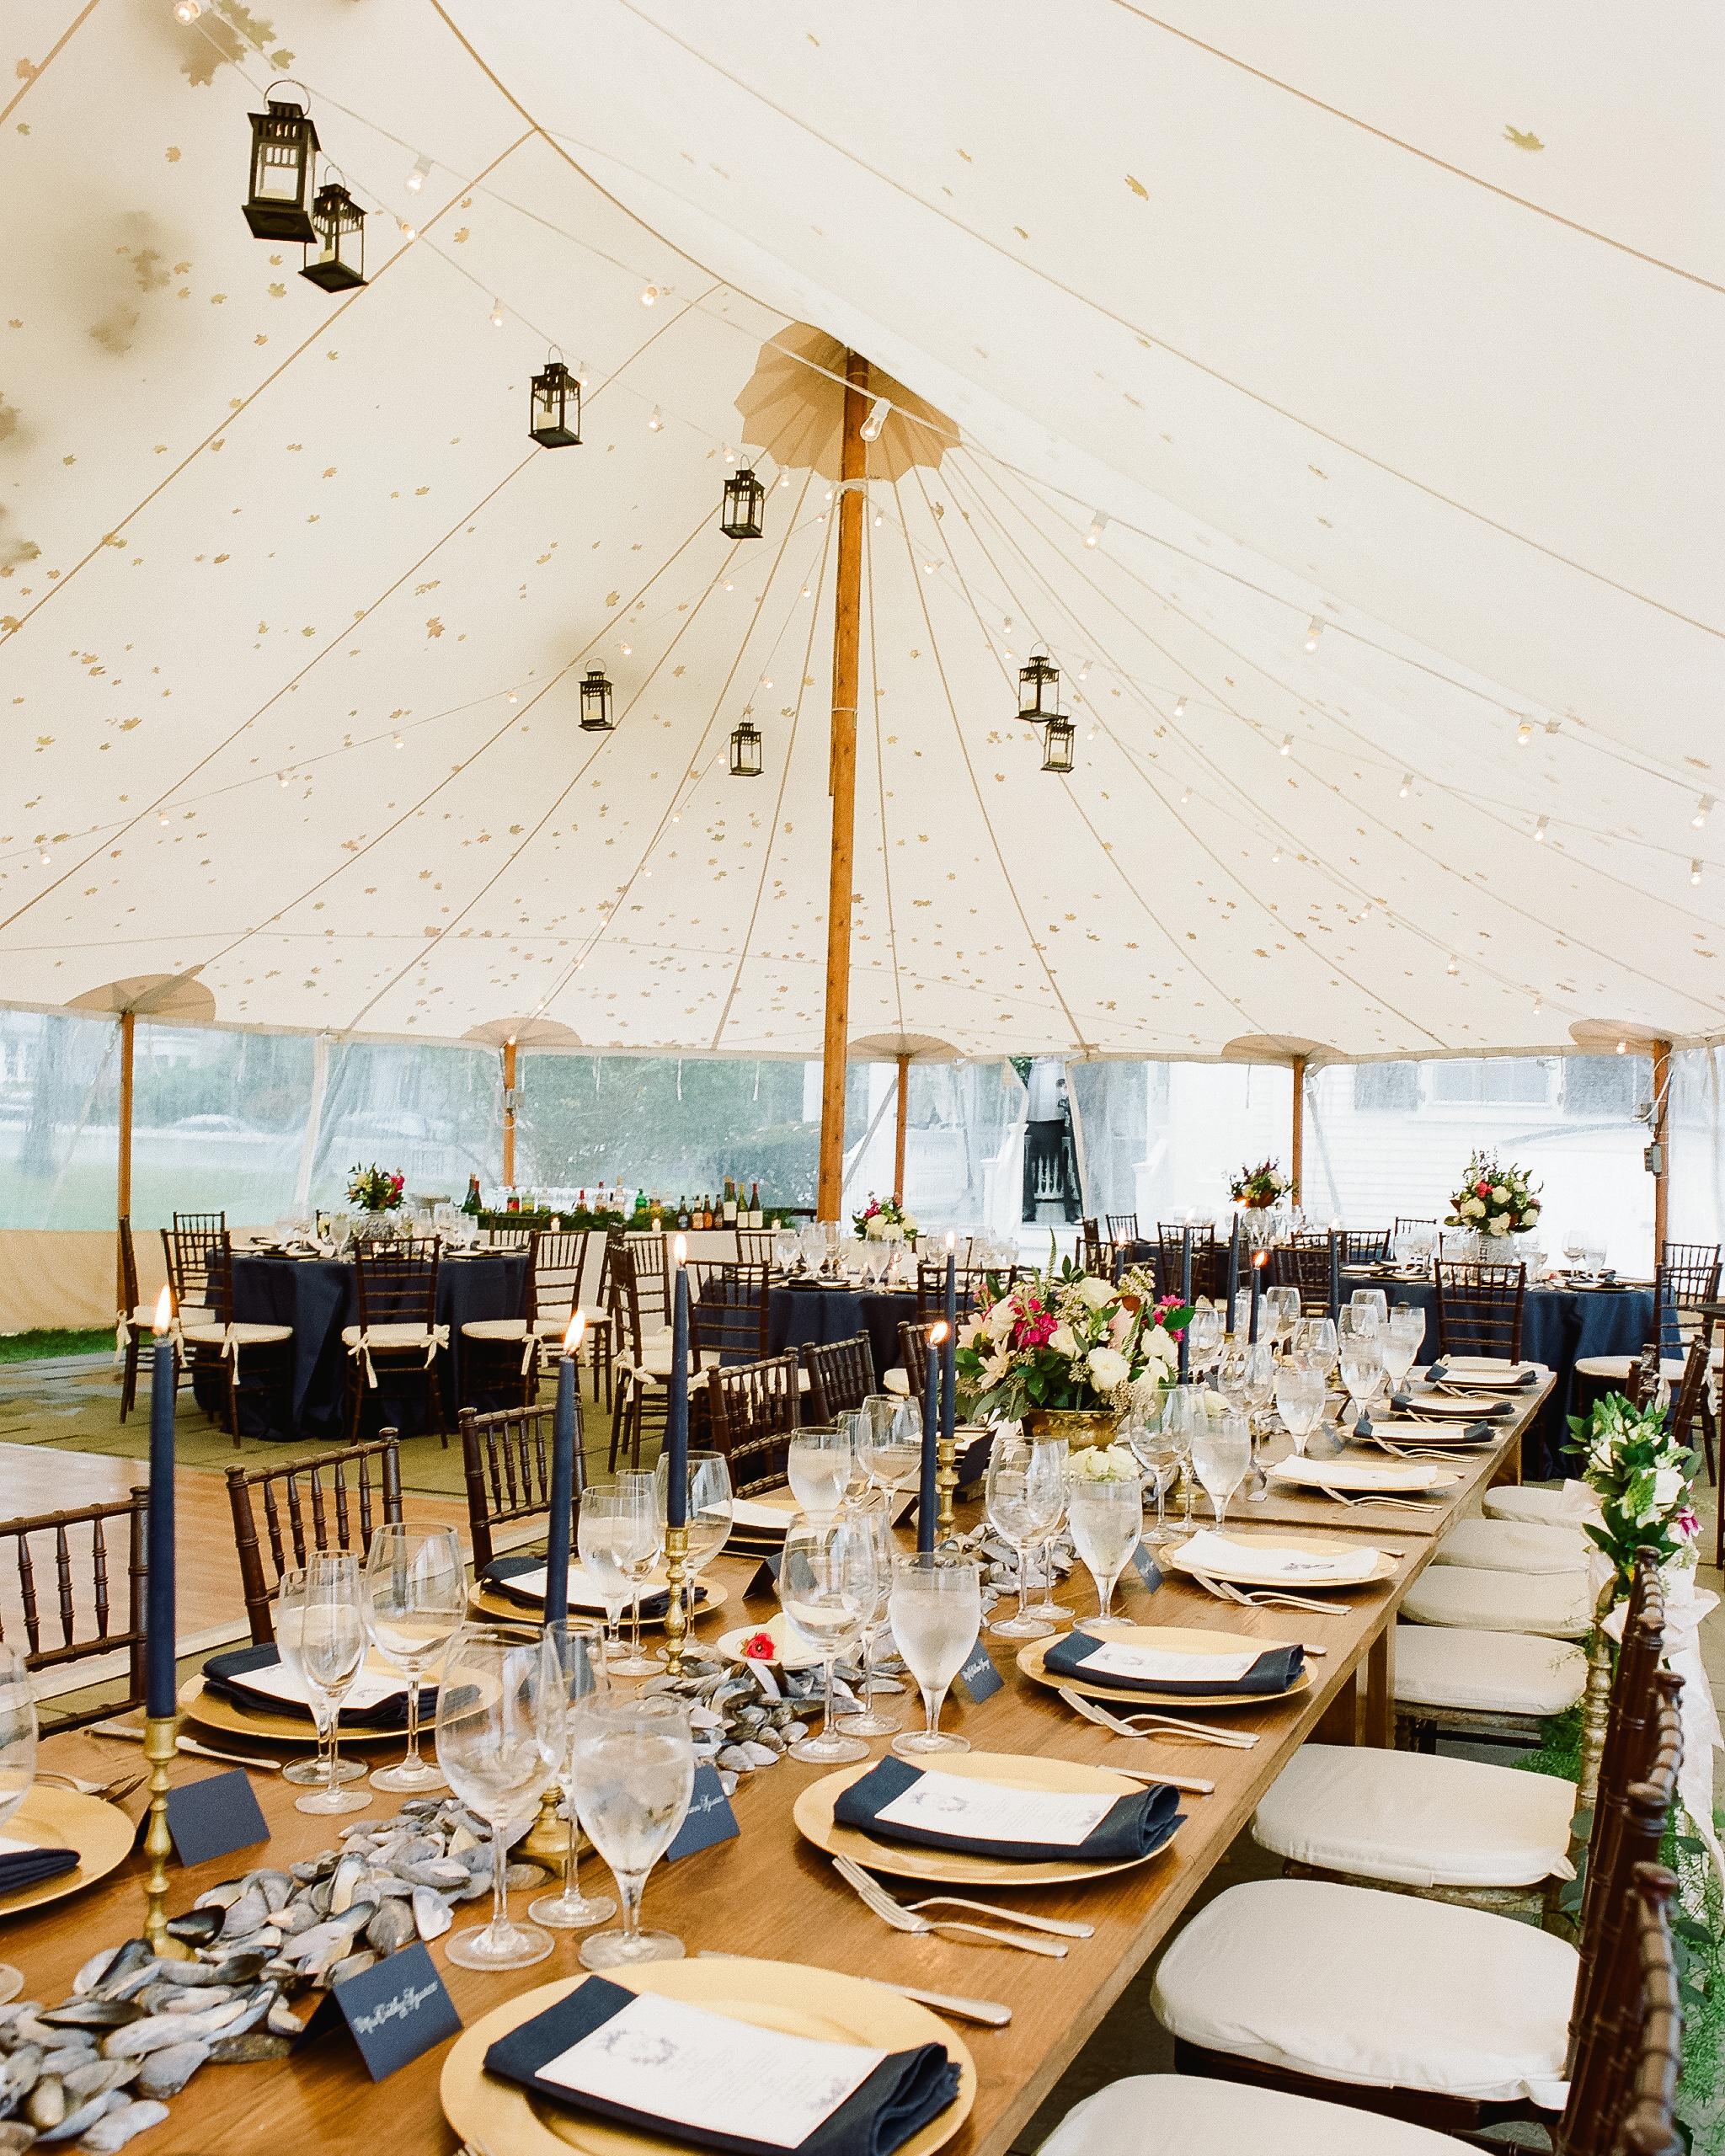 lindsay-garrett-wedding-tent-0741-s111850-0415.jpg